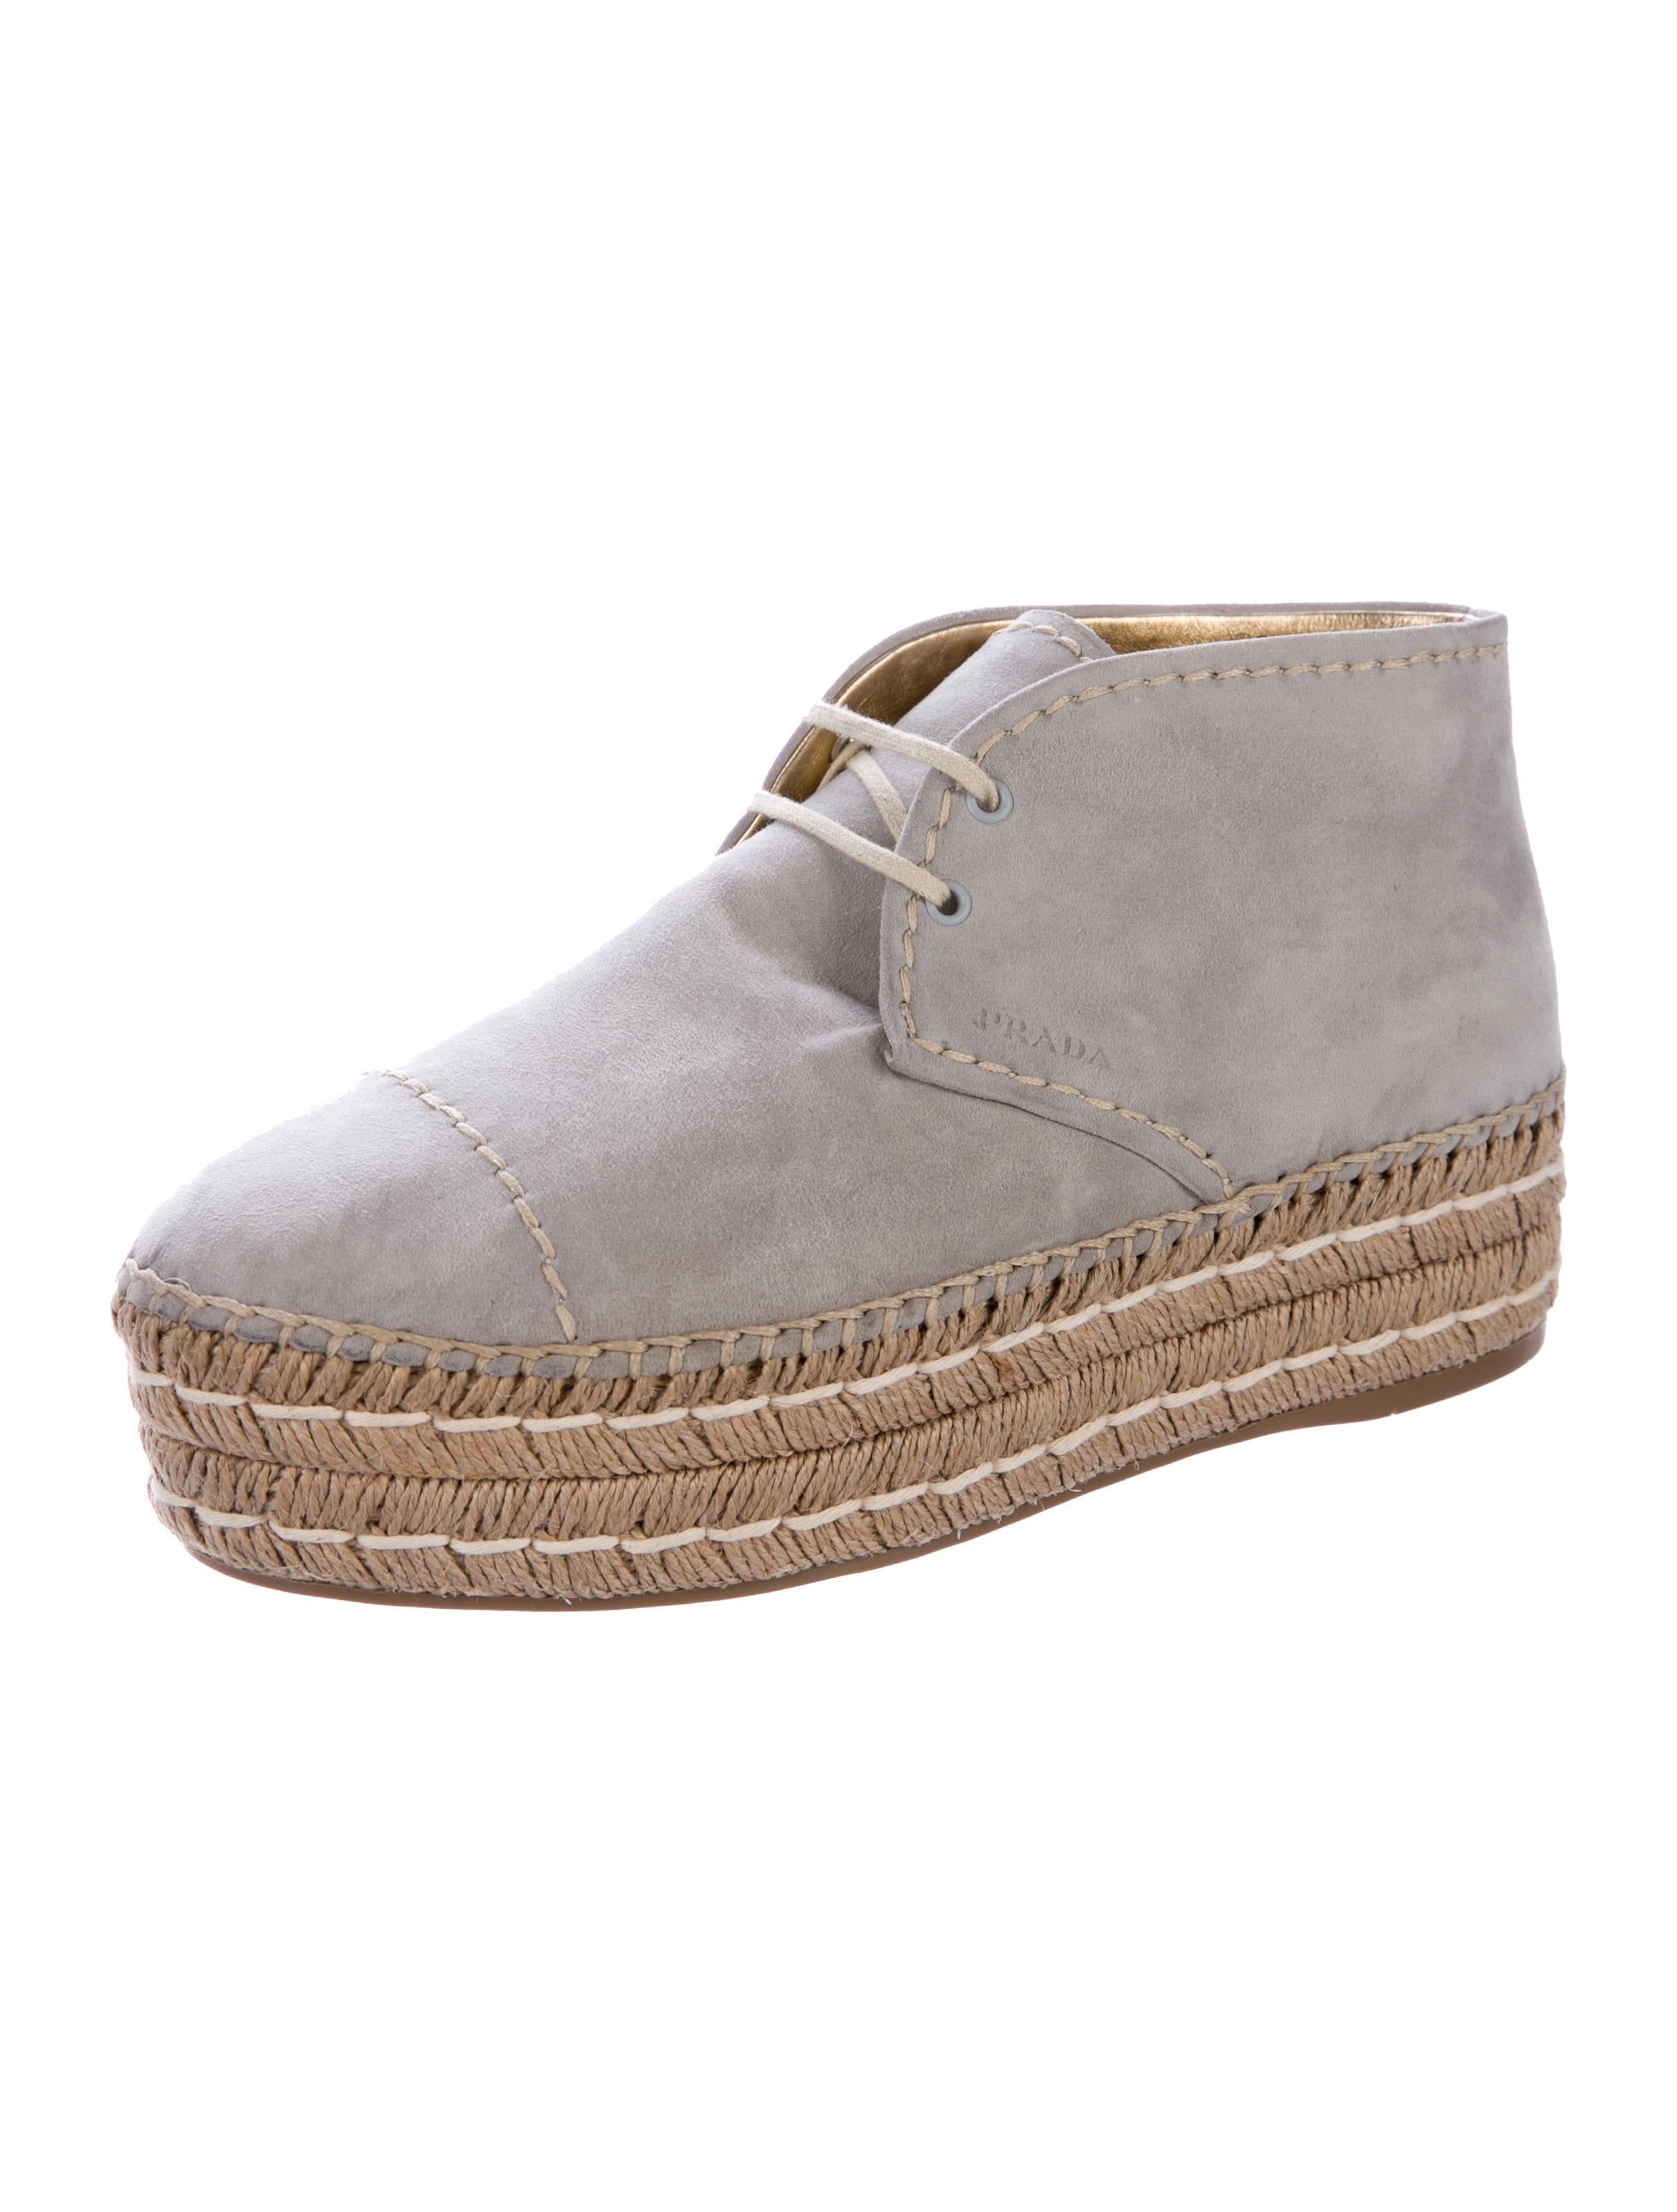 prada suede espadrille chukka boots shoes pra160278